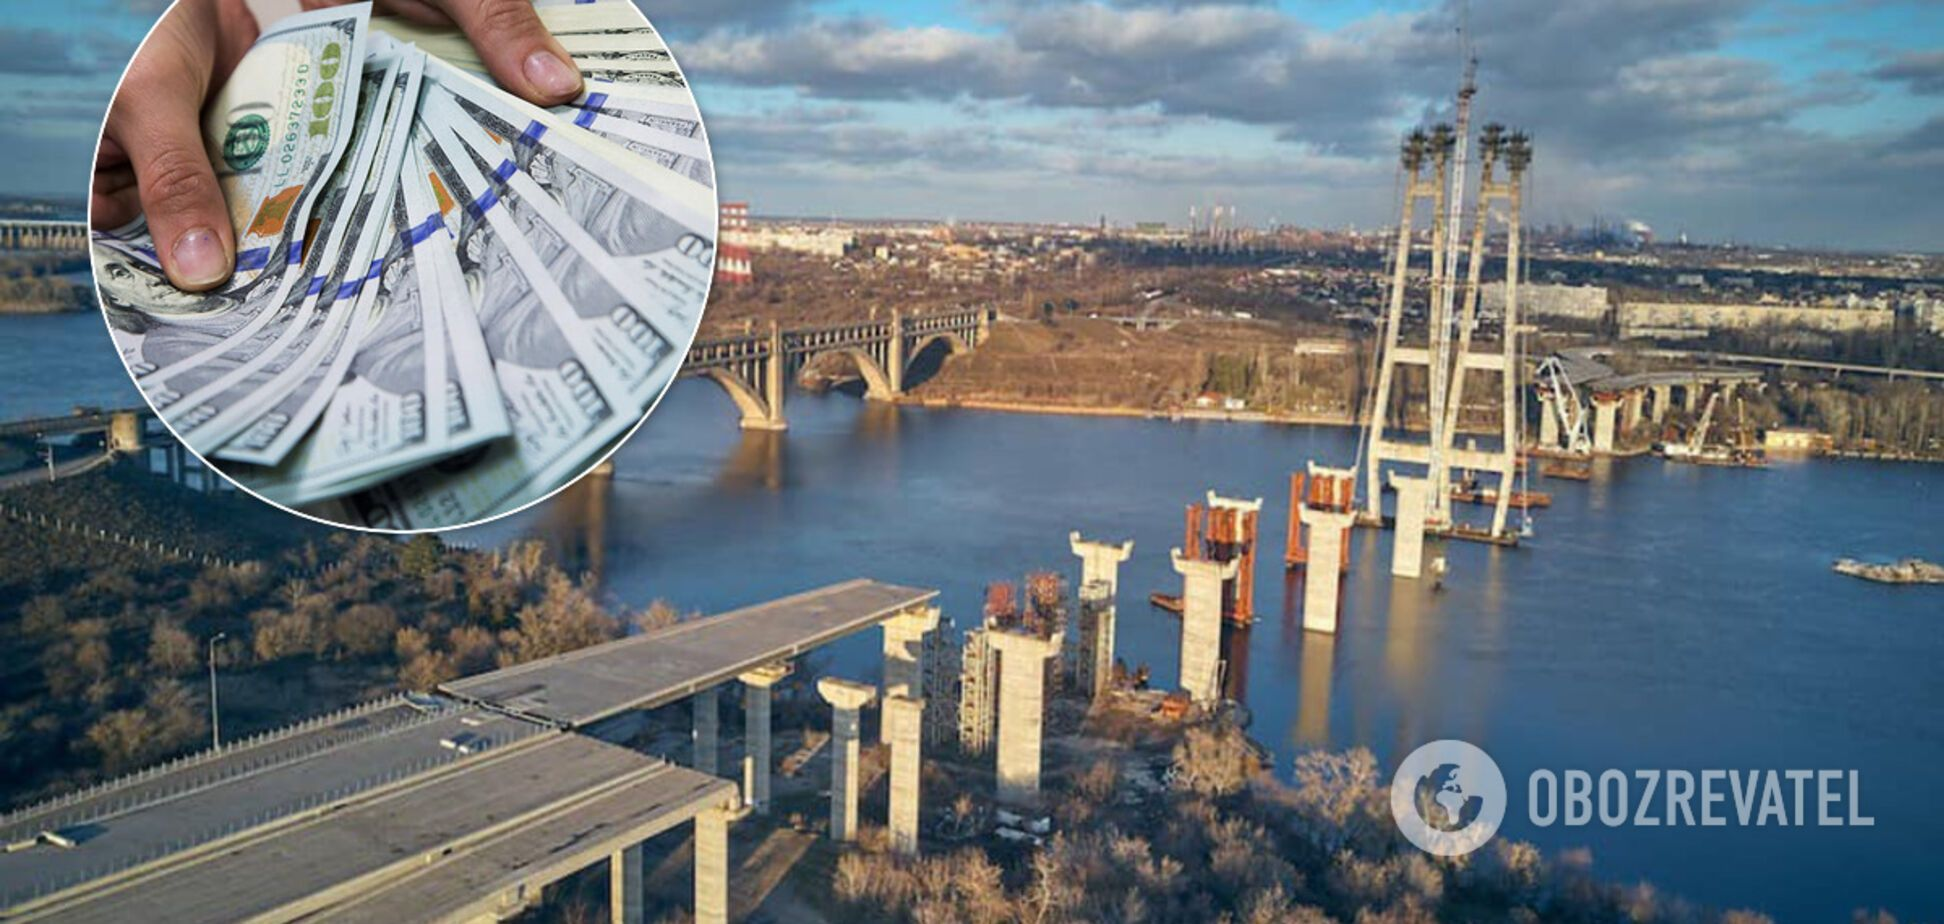 Мосты в Запорожье достроят за 11,9 млрд гривен: назван победитель тендера